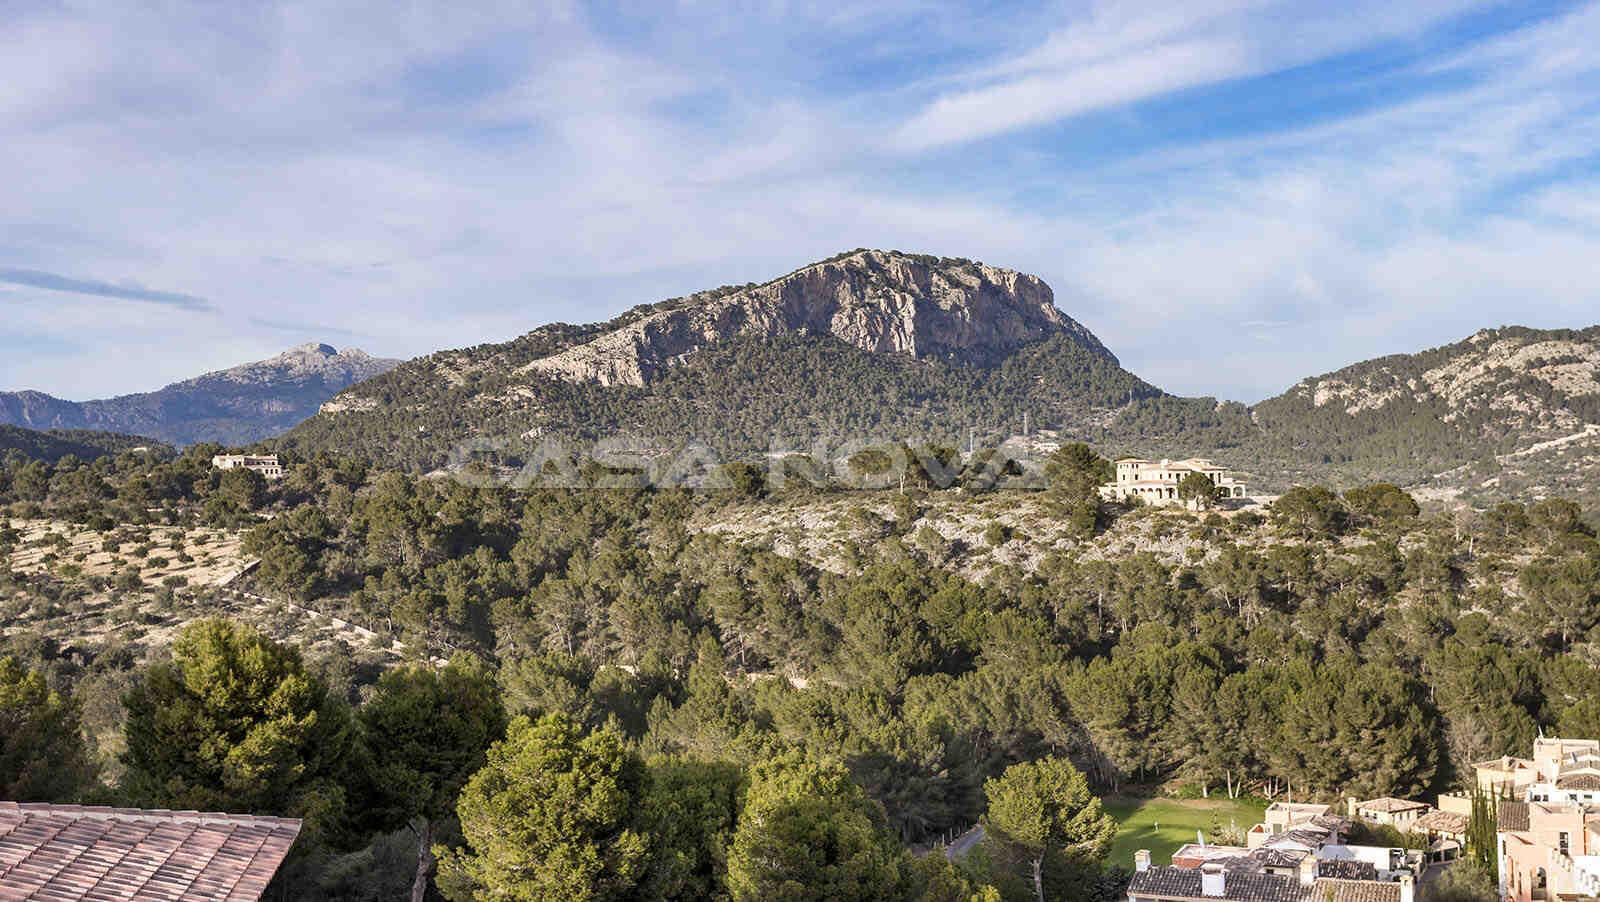 Wundervoller Panorama- Landschaftsblick